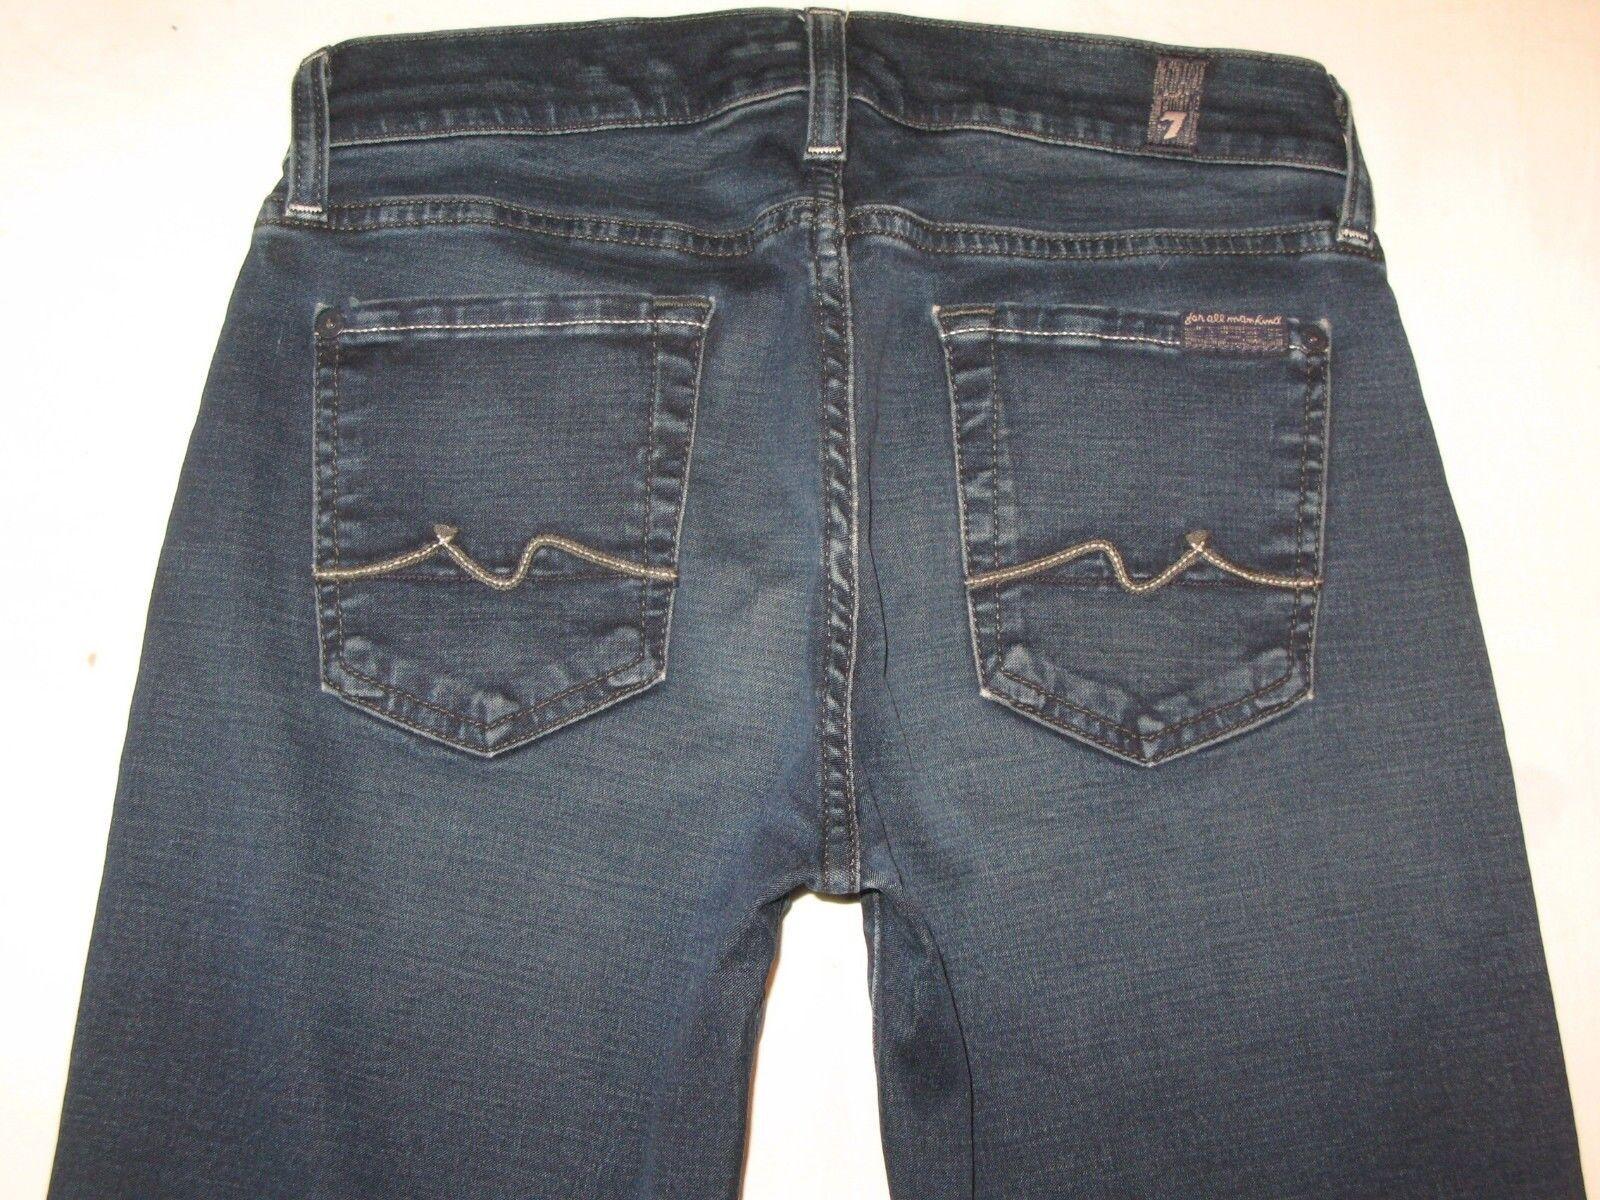 7 for all Mankind Womens Bootcut Jeans Sz 26 w Gummy Stretchy Denim Dark bluee